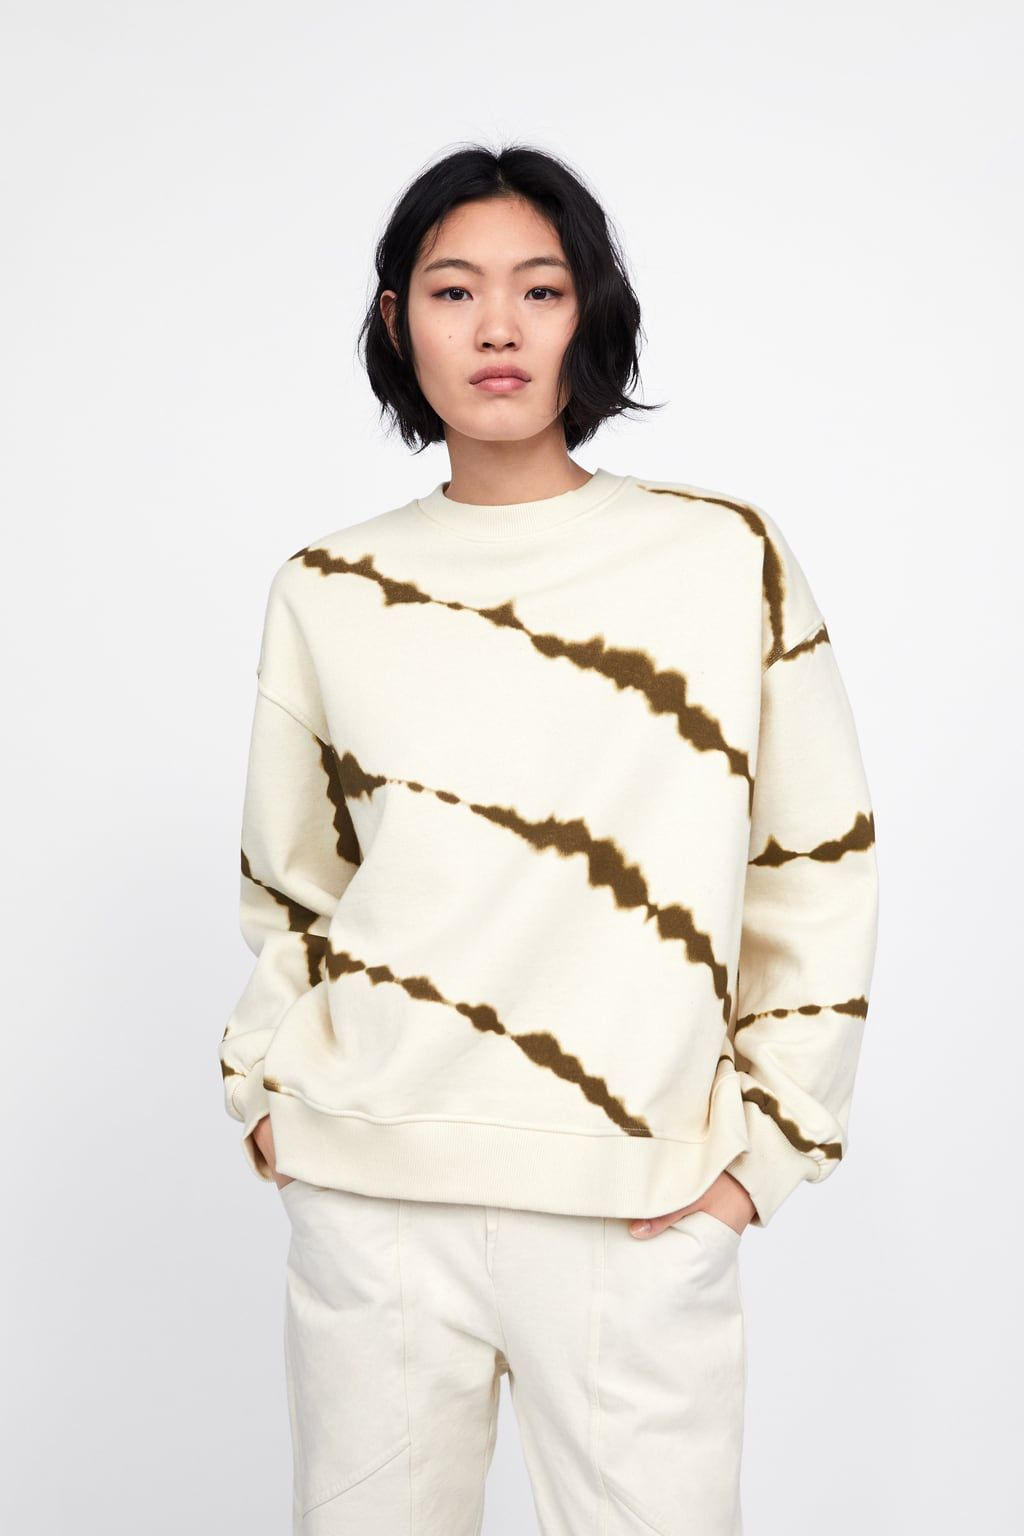 Image 2 Of Tie Dye Sweatshirt From Zara Batik Kleidung Modestil Schnurbatik [ 1536 x 1024 Pixel ]